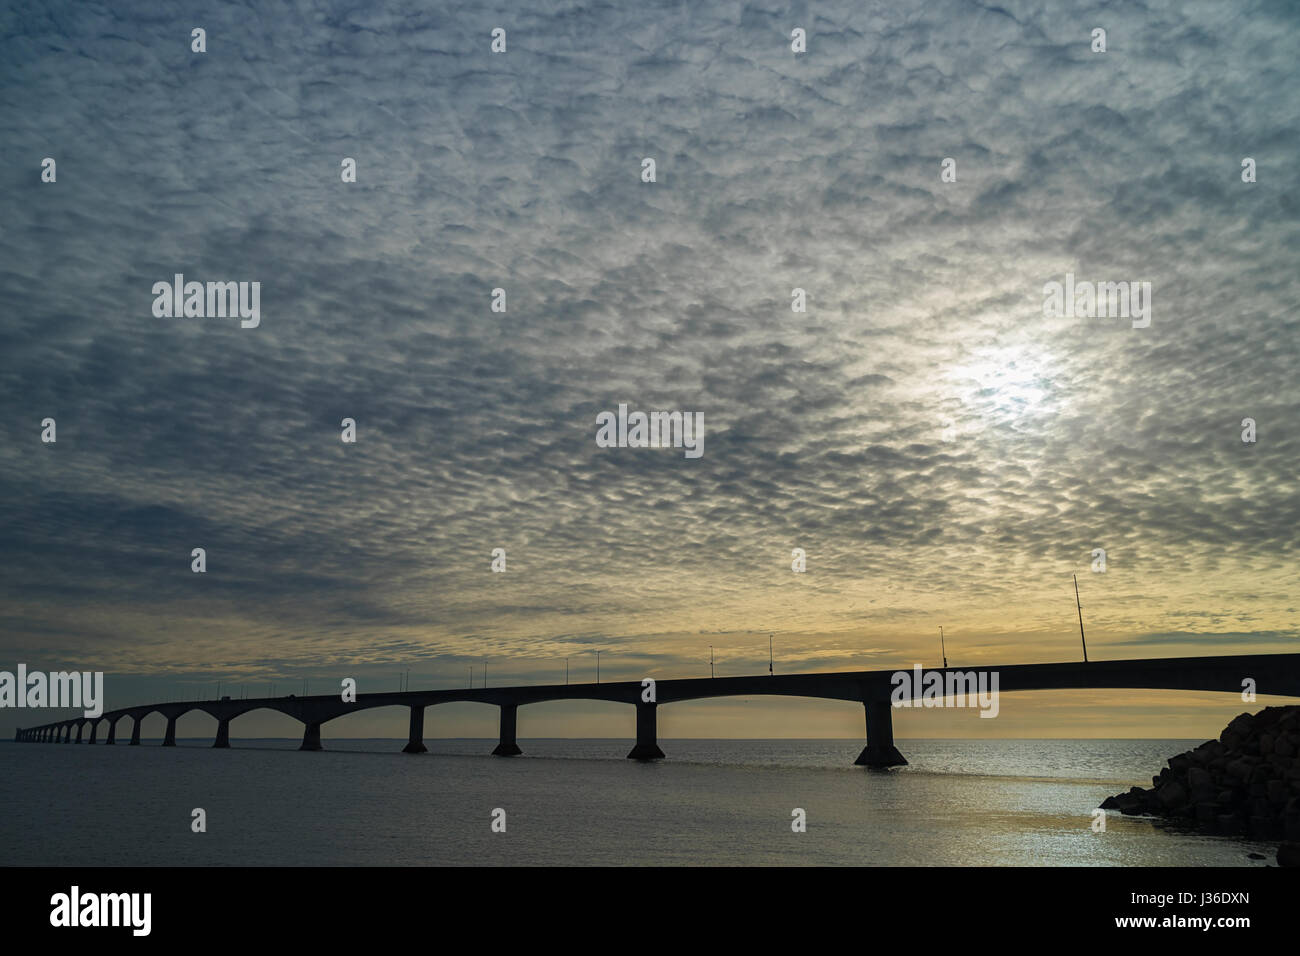 Cloudy skies over the Confederation Bridge linking Prince Edward Island with mainland New Brunswick, Canada. Stock Photo